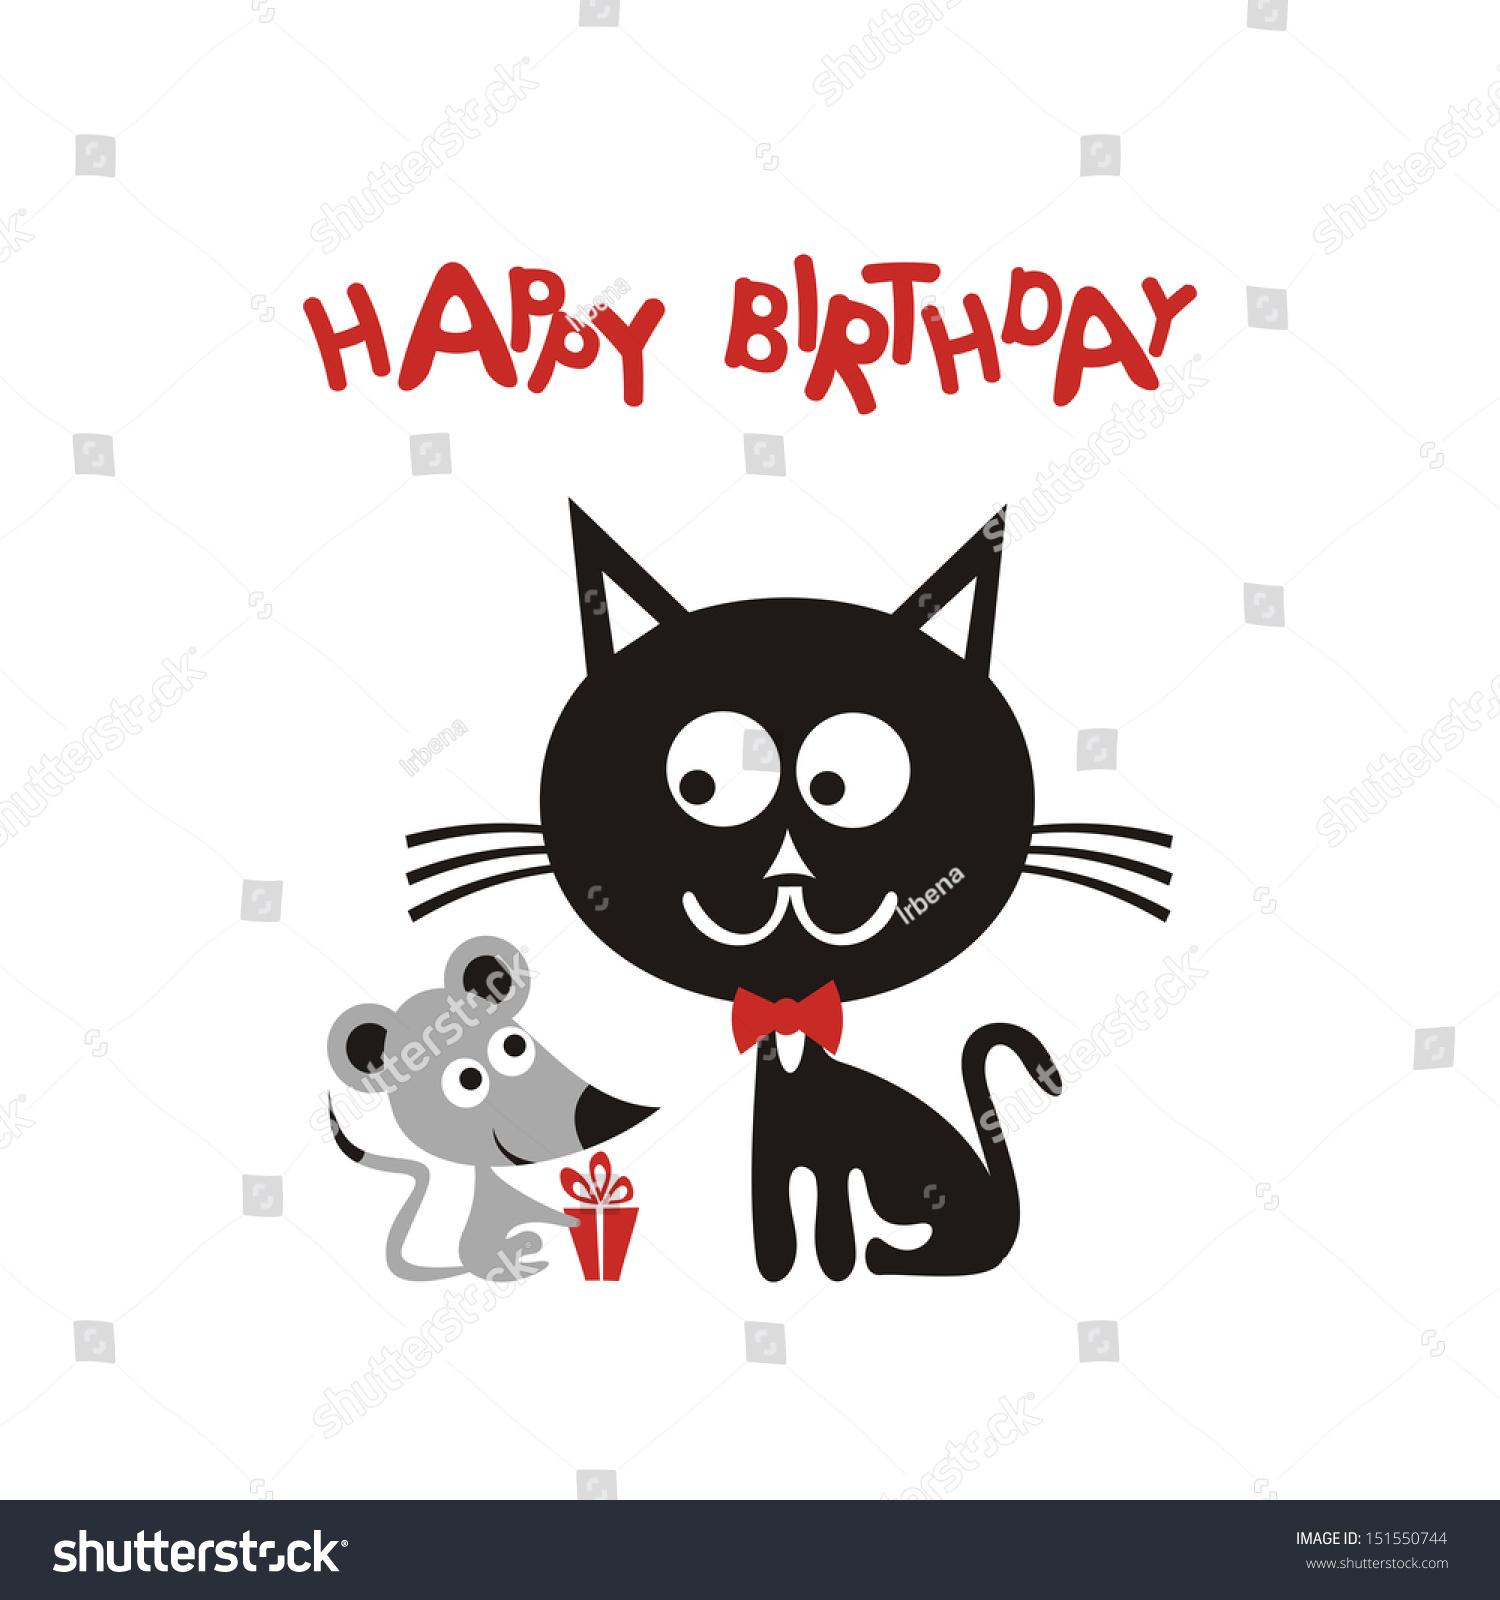 Happy Birthday Greeting Card Cartoon Cute Stock Illustration